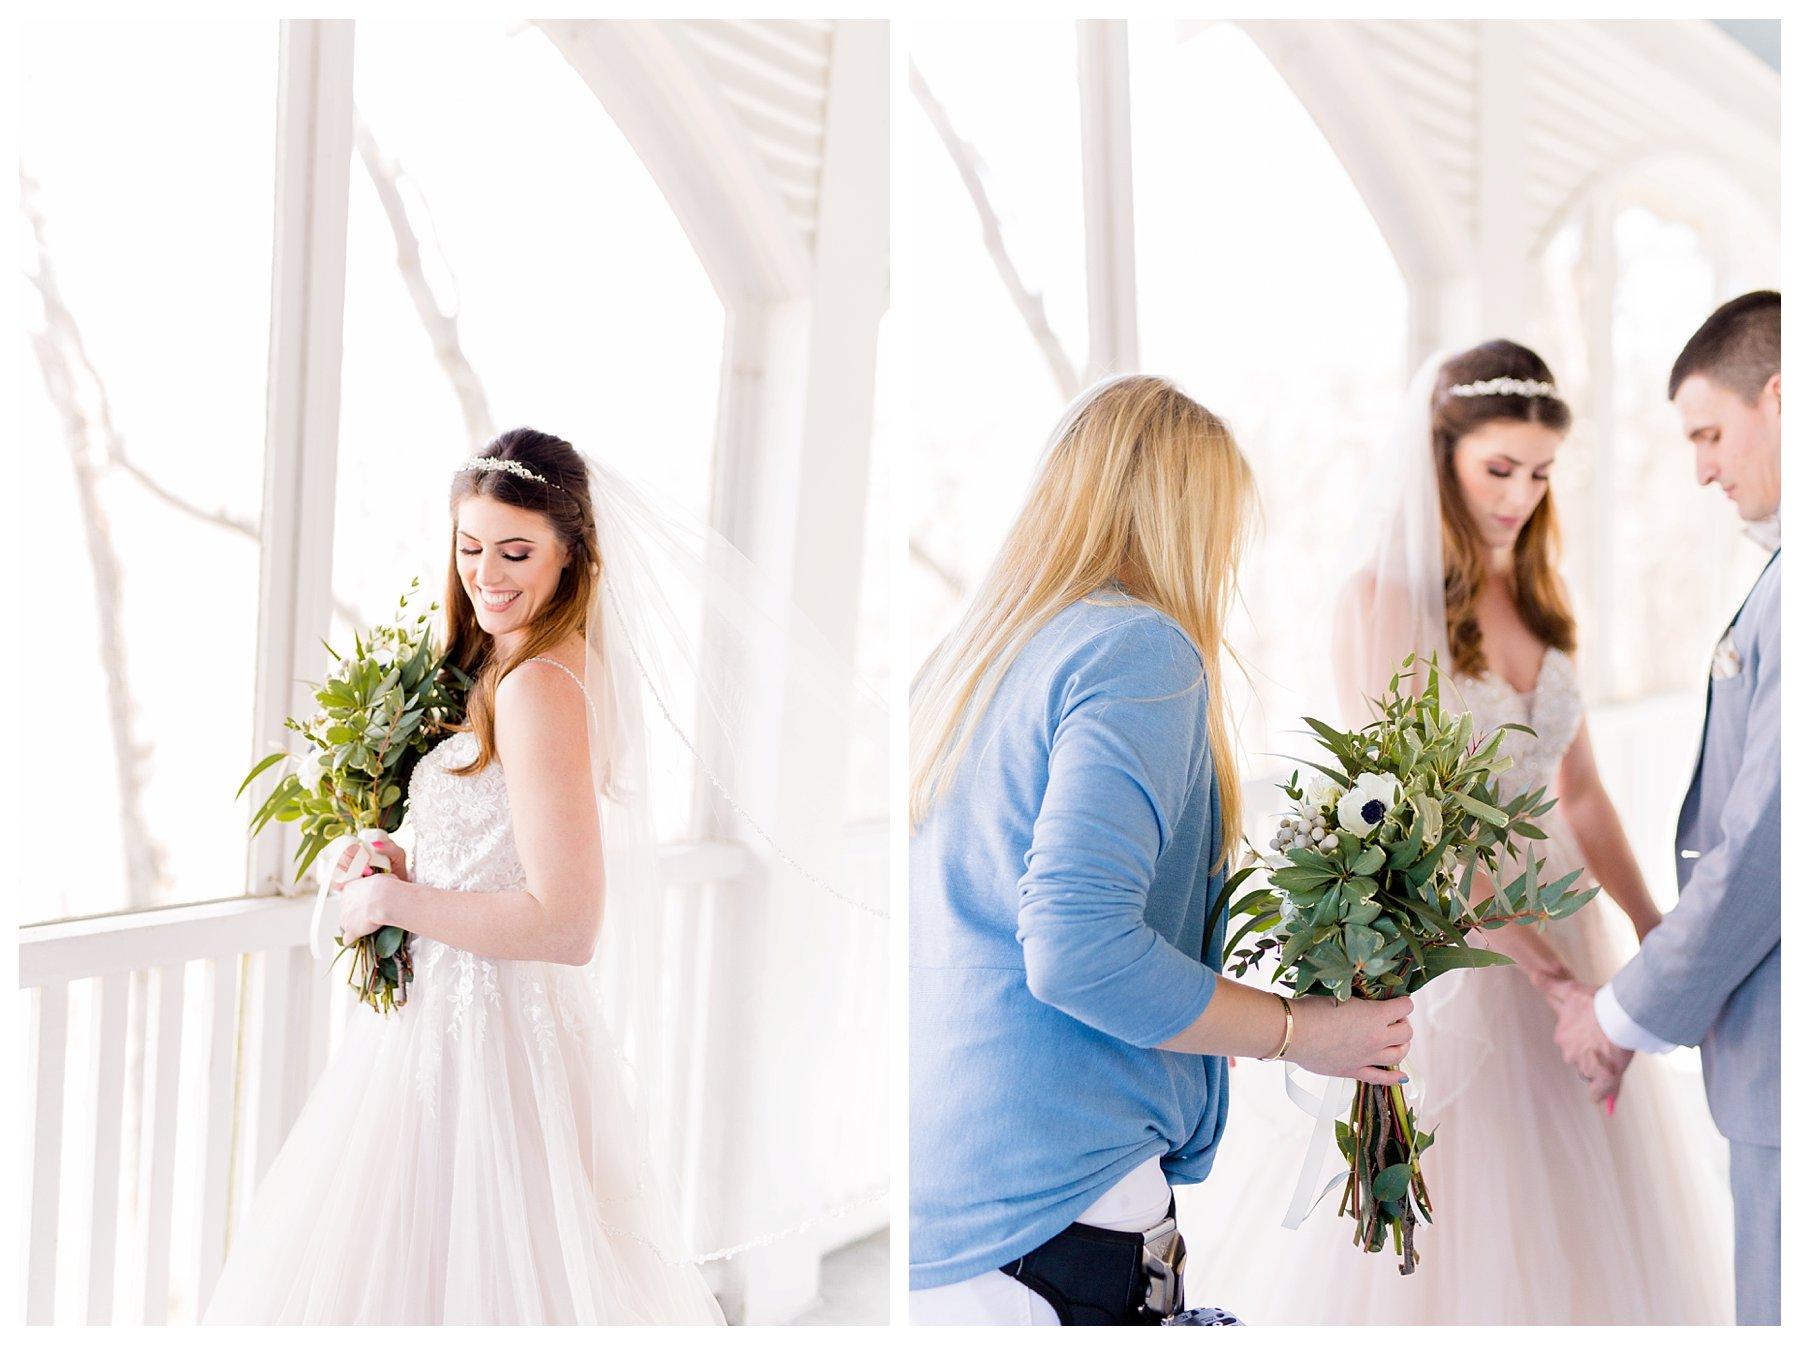 photographer_wedding_saint_louis_Kansas_City_Photography_Videography_workshop_training_styled_engagement_Lake_Ozark_KC_MO_STL_Rolla_Hermann_Saint_James_0397.jpg